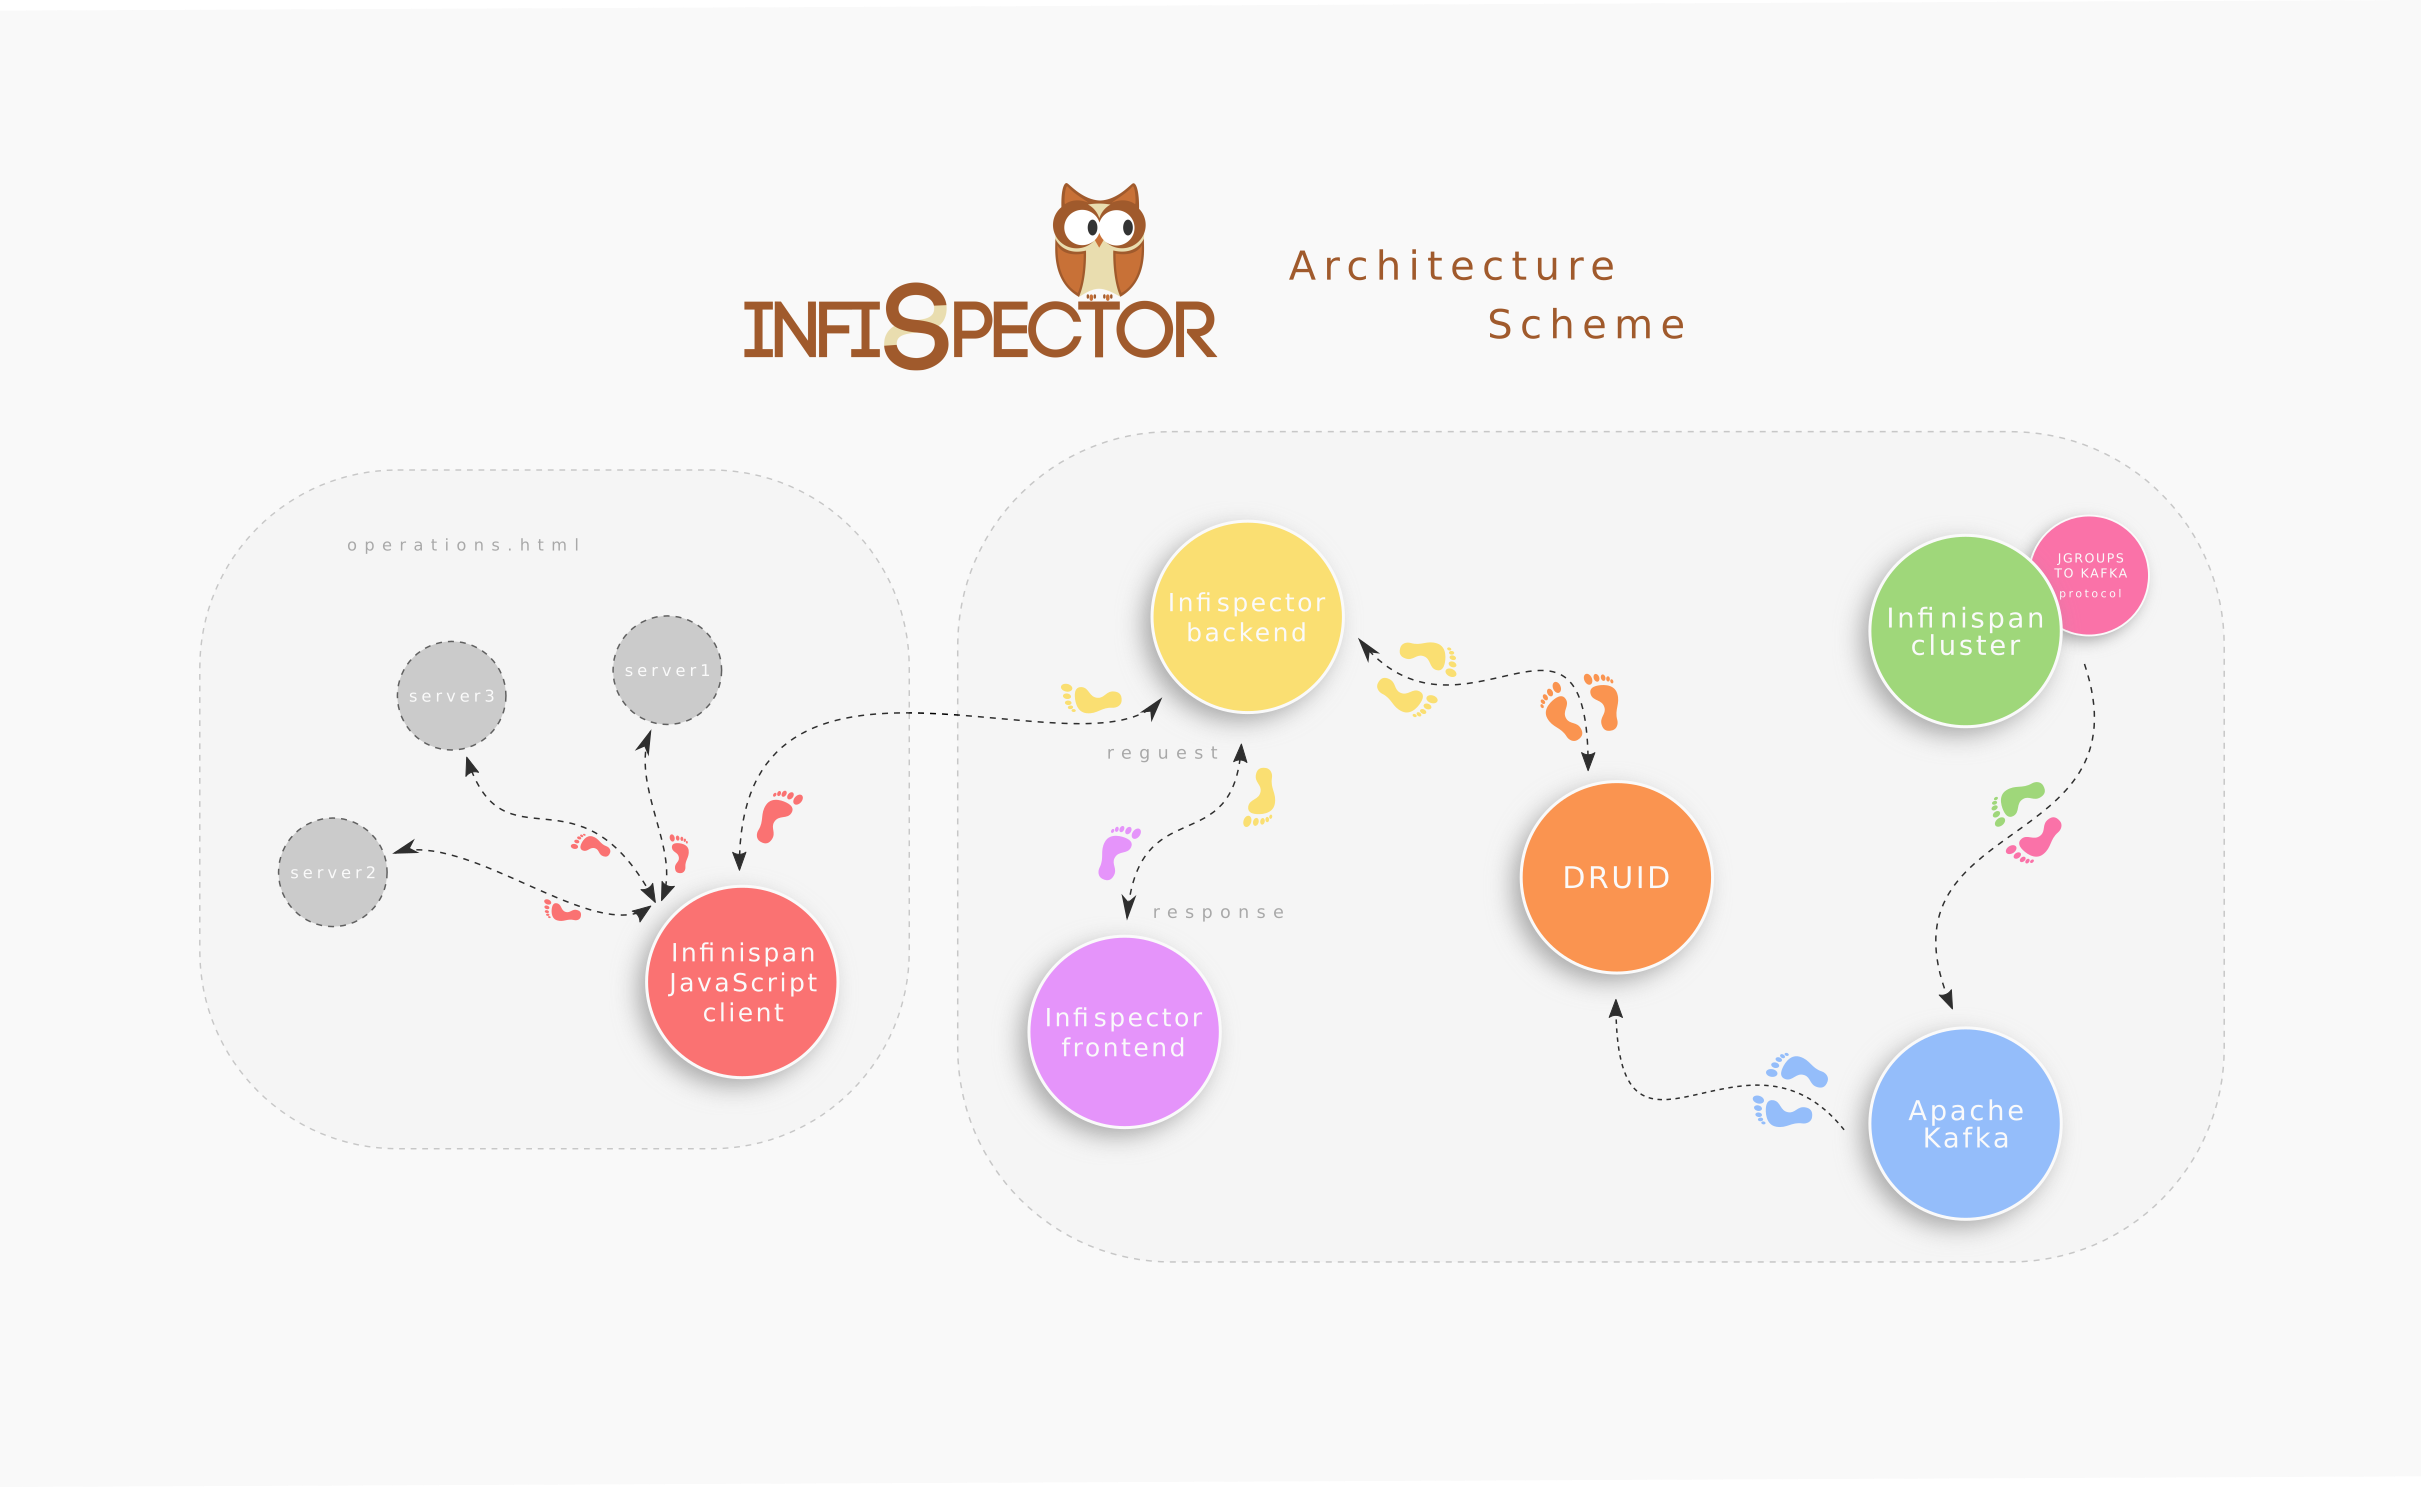 infispector/README_MAIN md at master · infinispan/infispector · GitHub